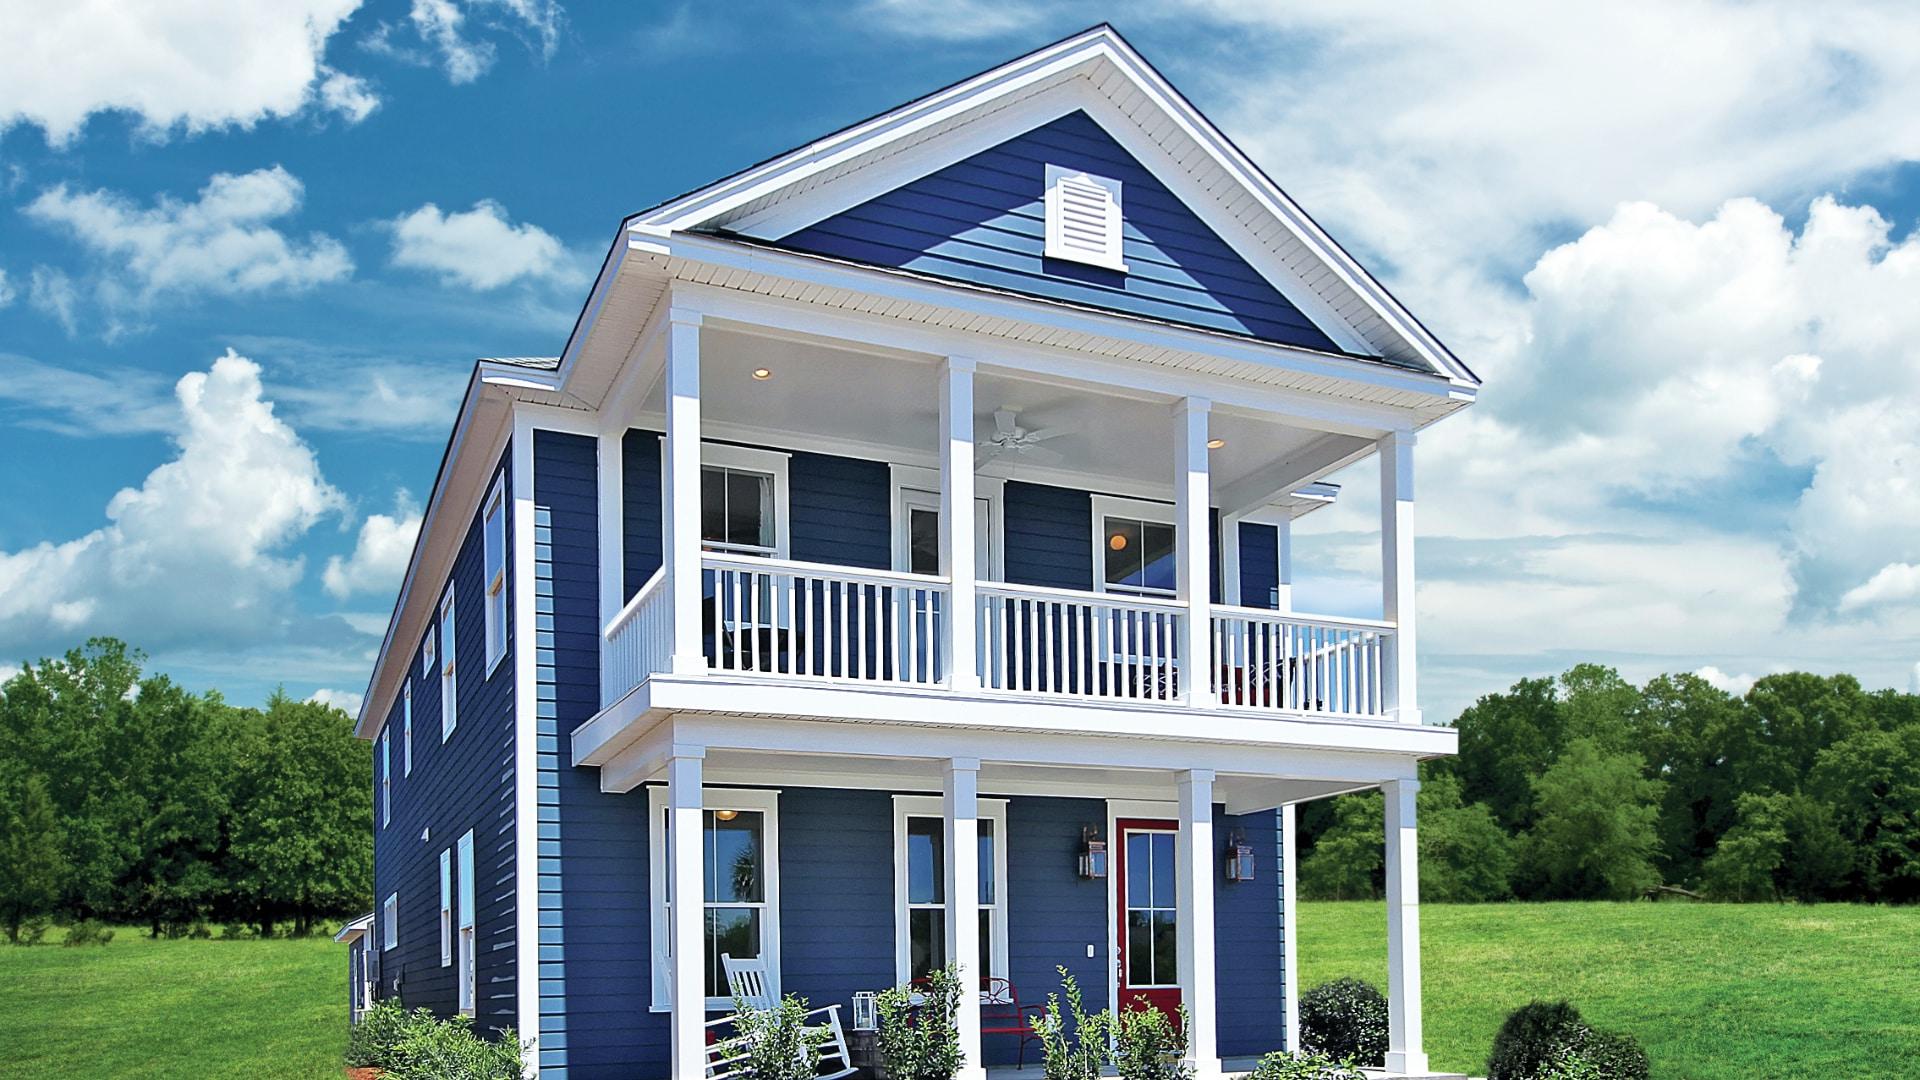 Johnston Pointe model home exterior